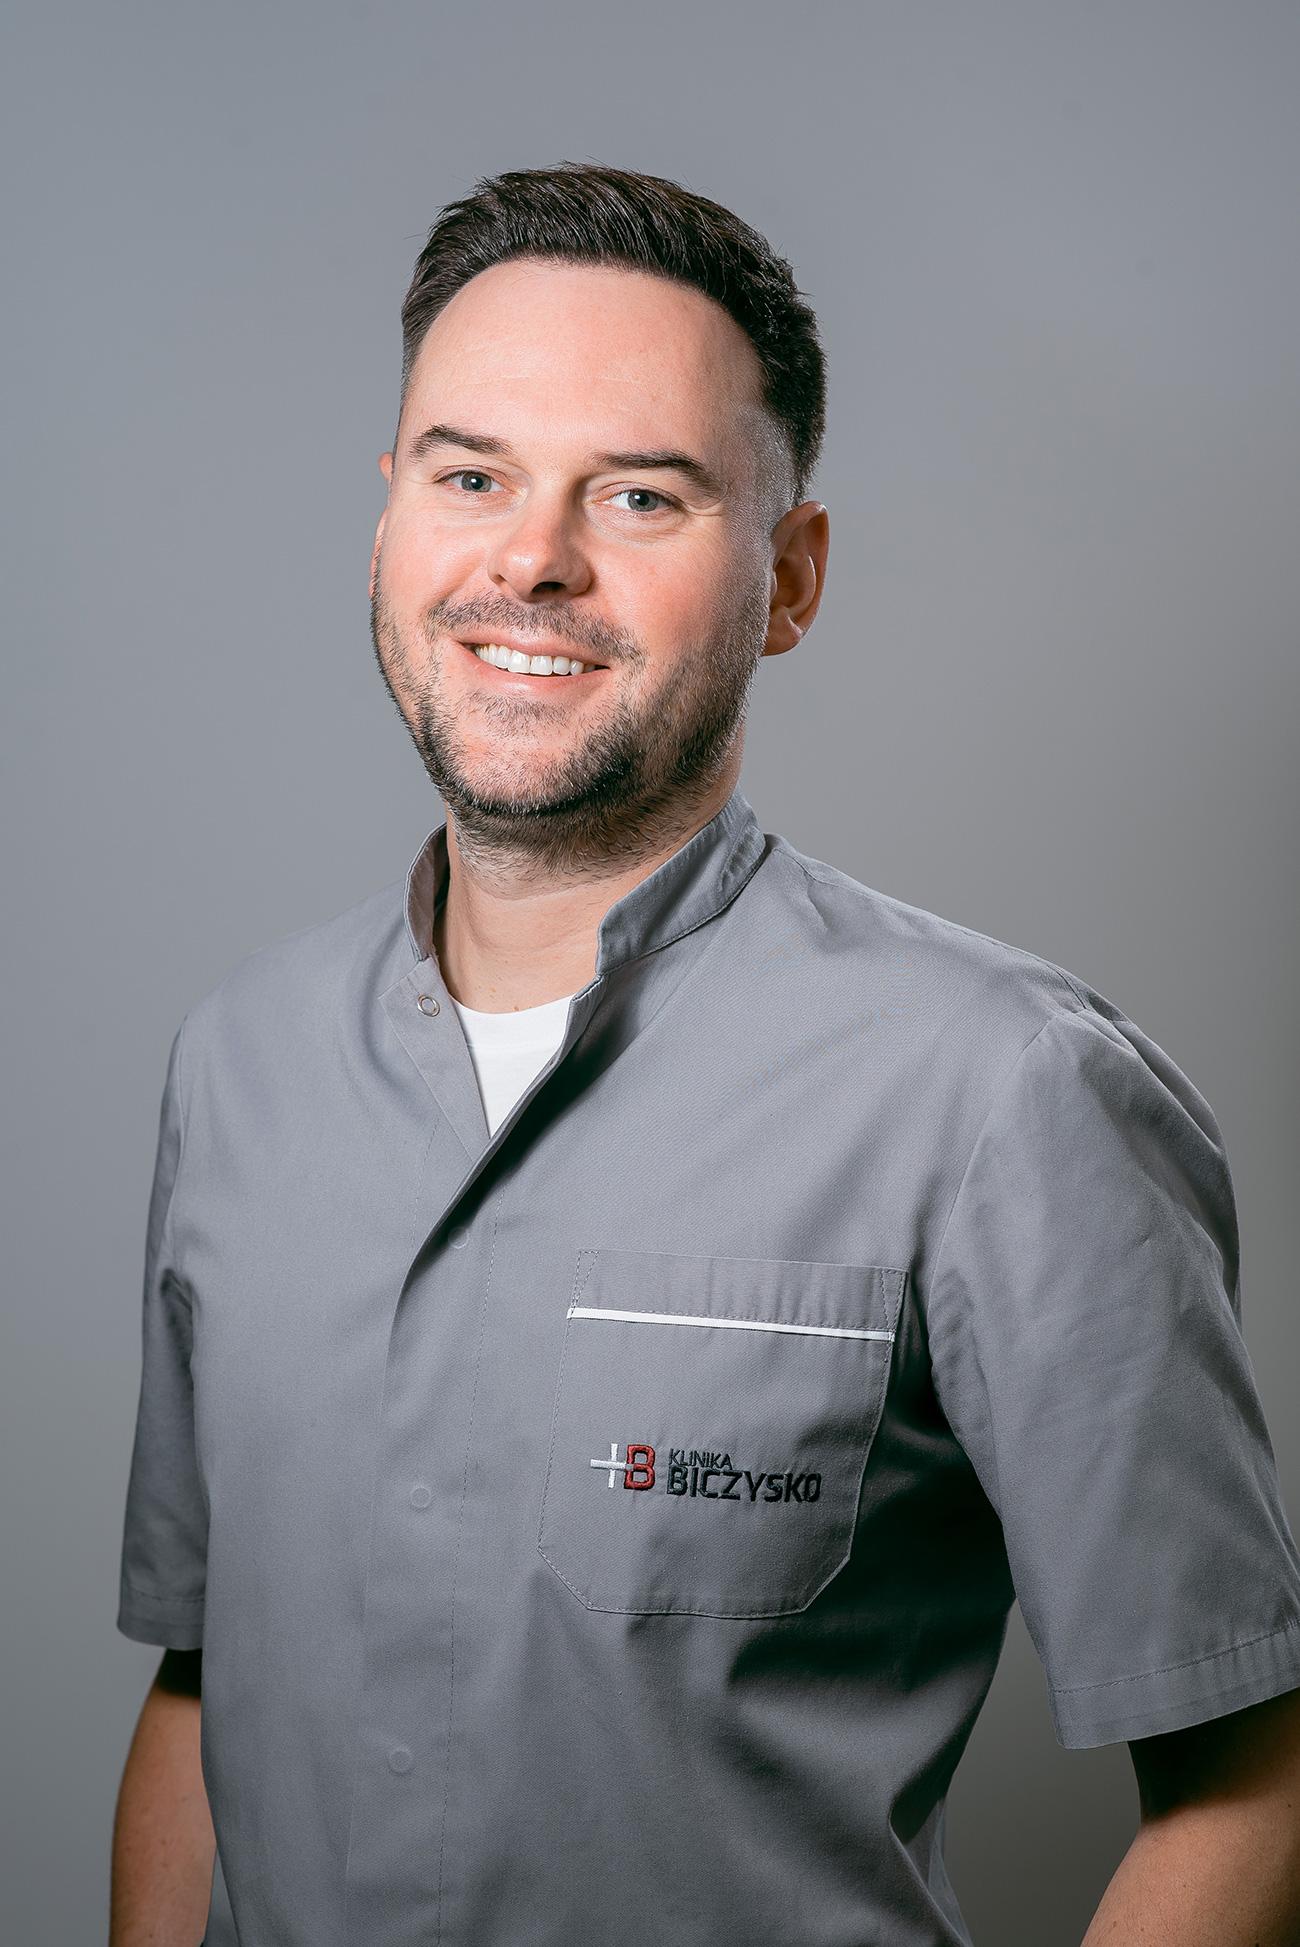 lekarz stomatolog<br> chirurgia stomatologiczna<br> implantologia<br><br>